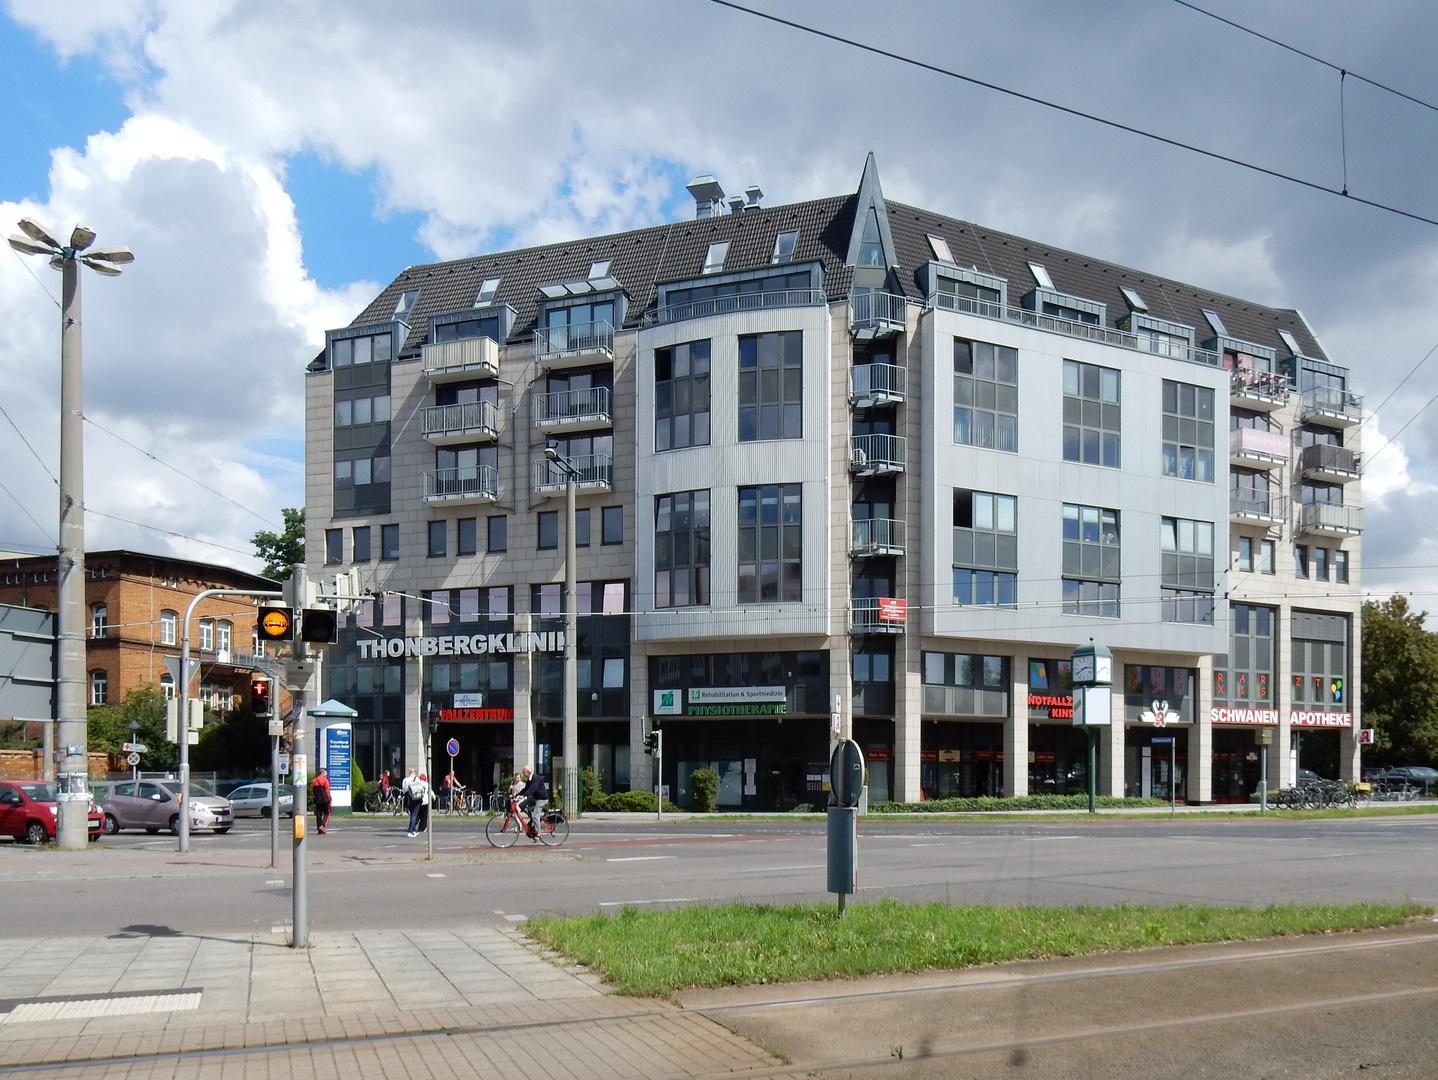 Thonbergklinik Leipzig